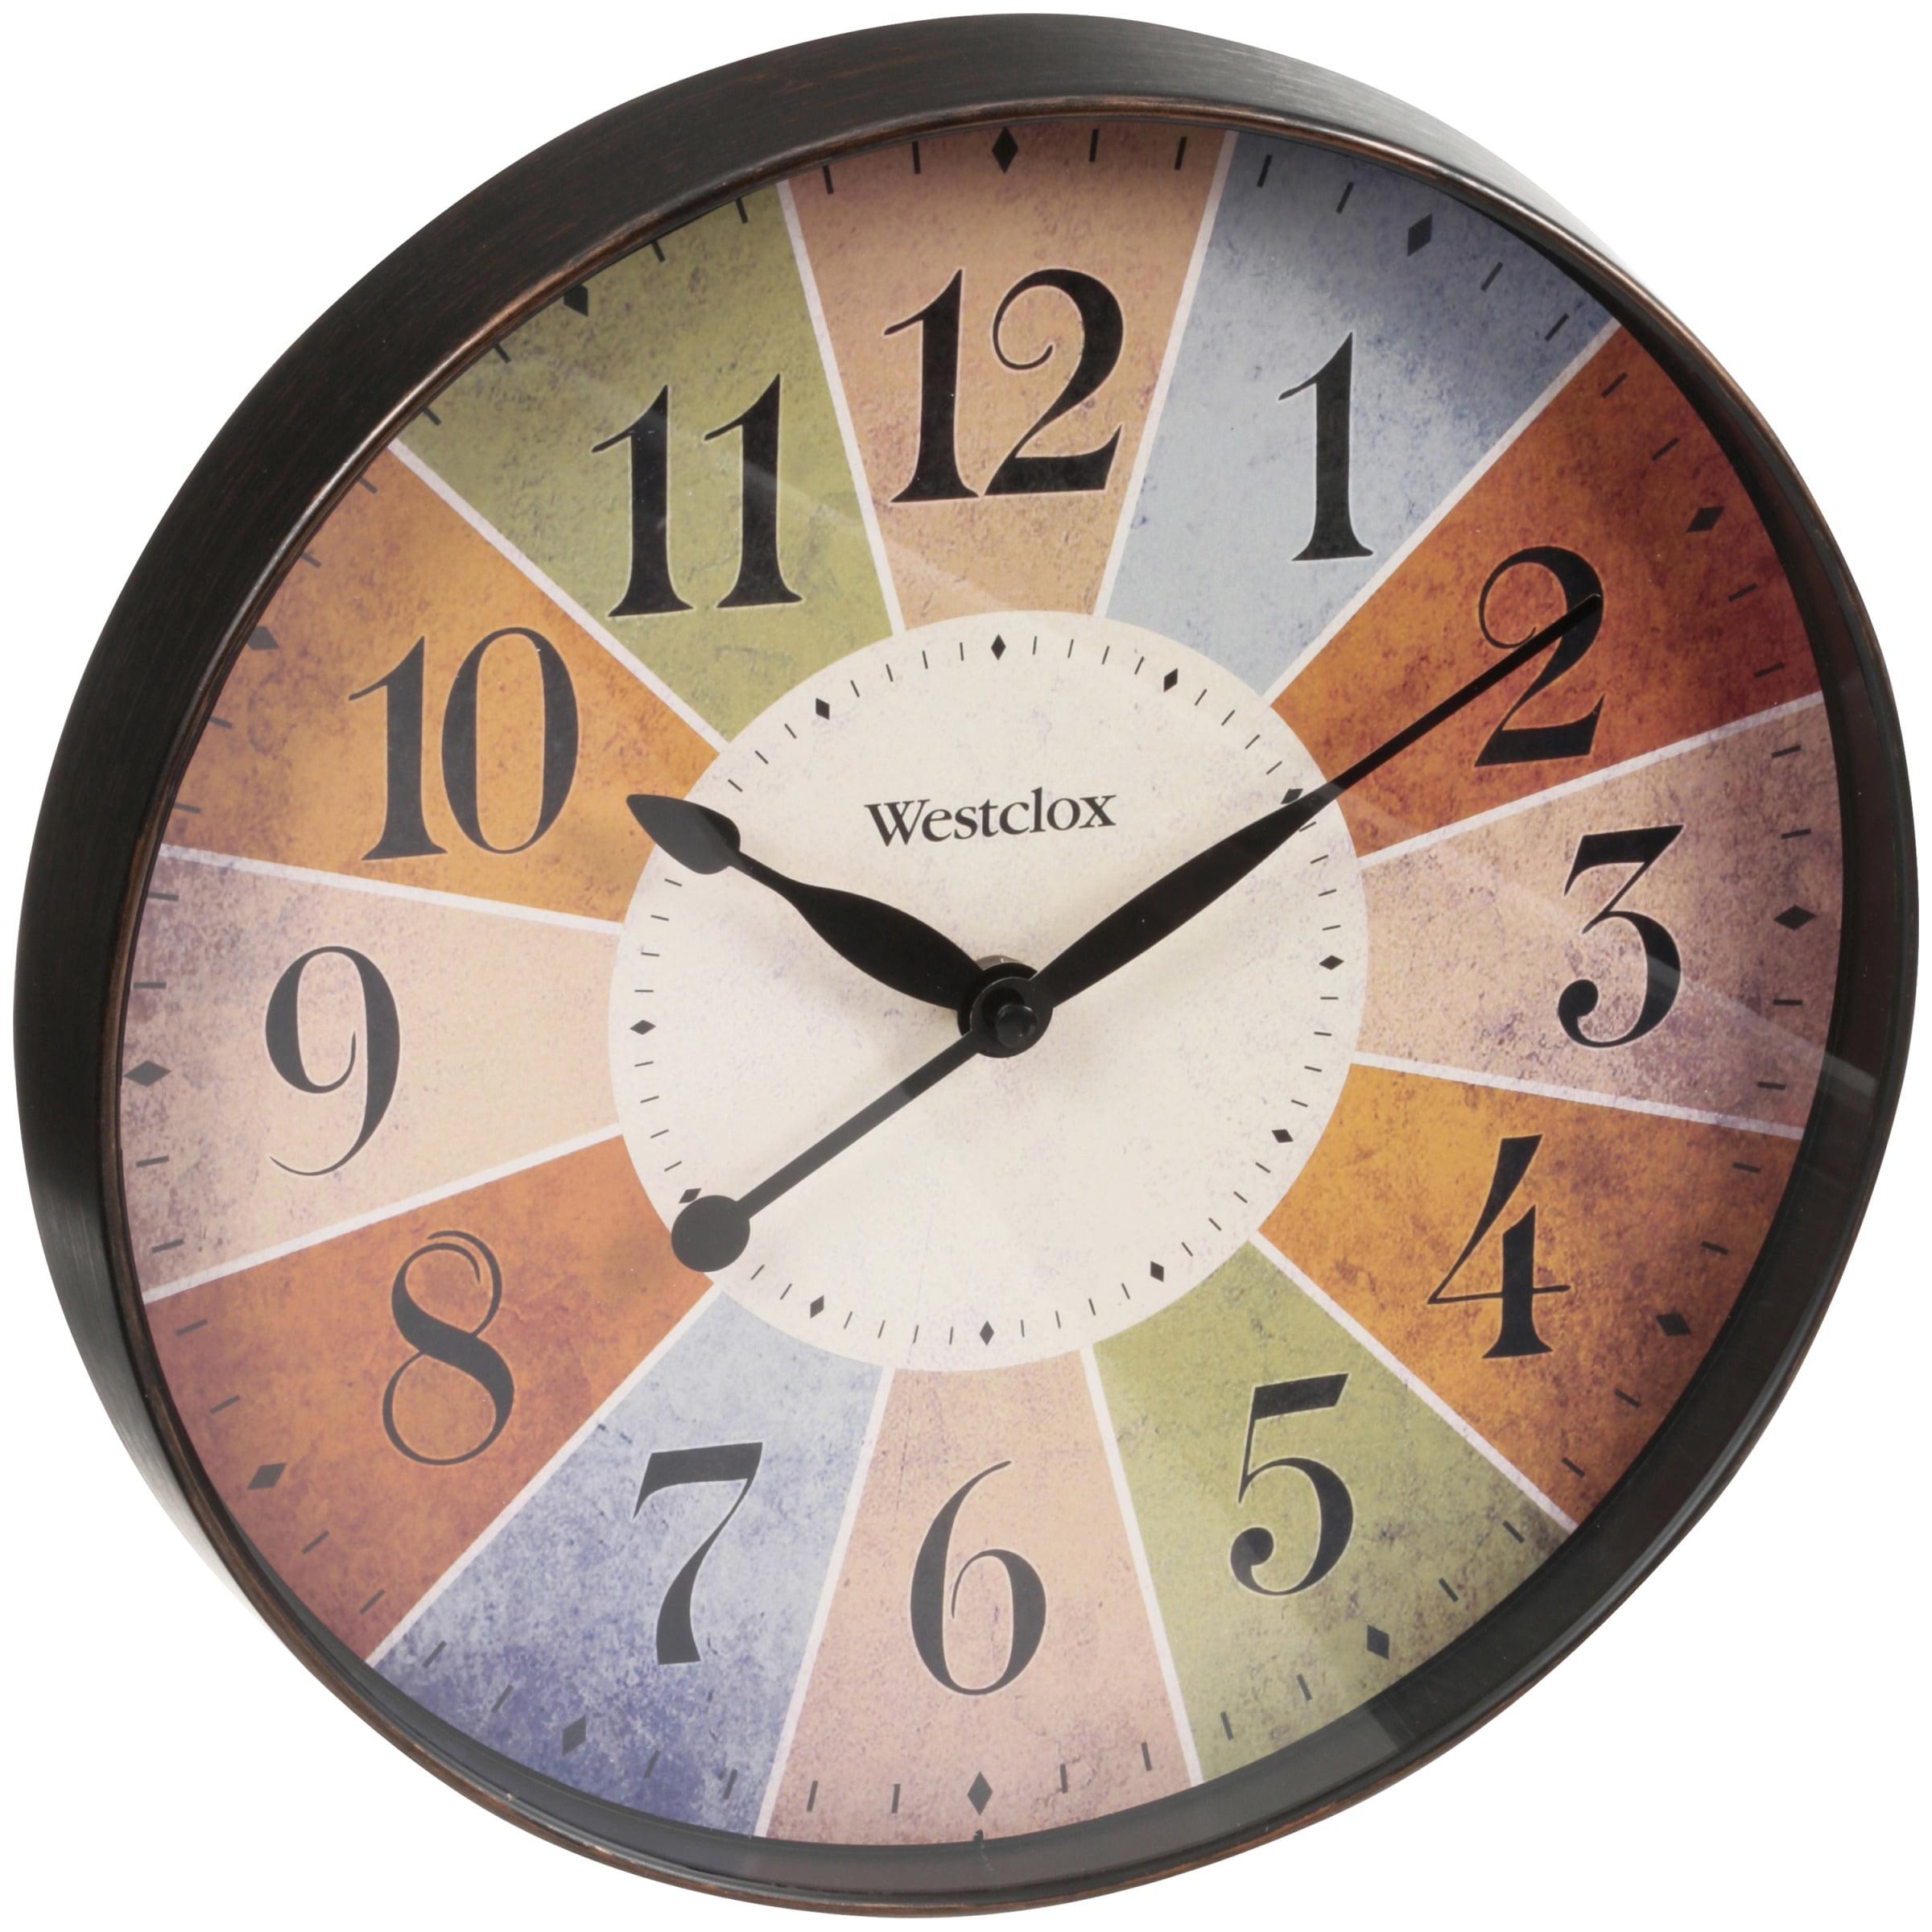 "Westclox 12"" Multi-colored Quartz Wall Clock- Style# 32897"